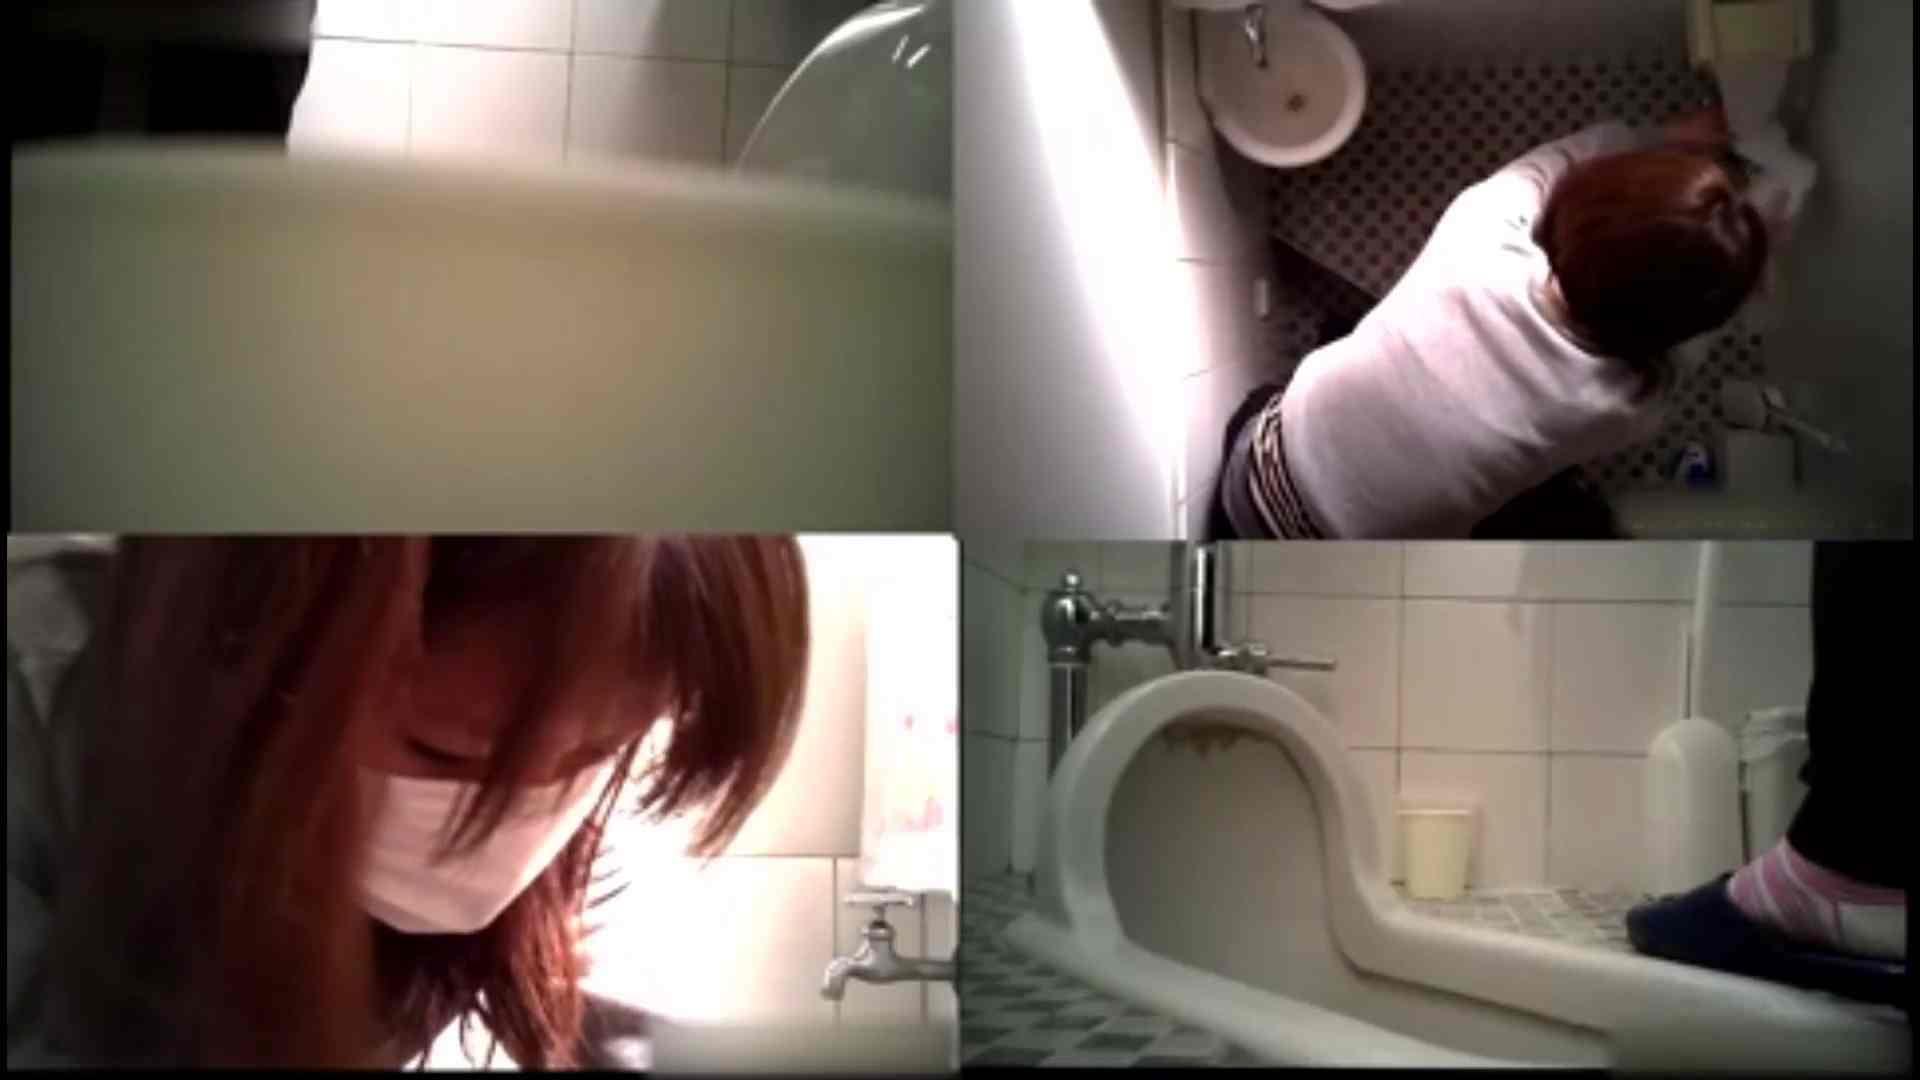 Vol.05 花の女子大生 トイレ恥態 進化系マルチアングル!! 女子大生  80pic 21